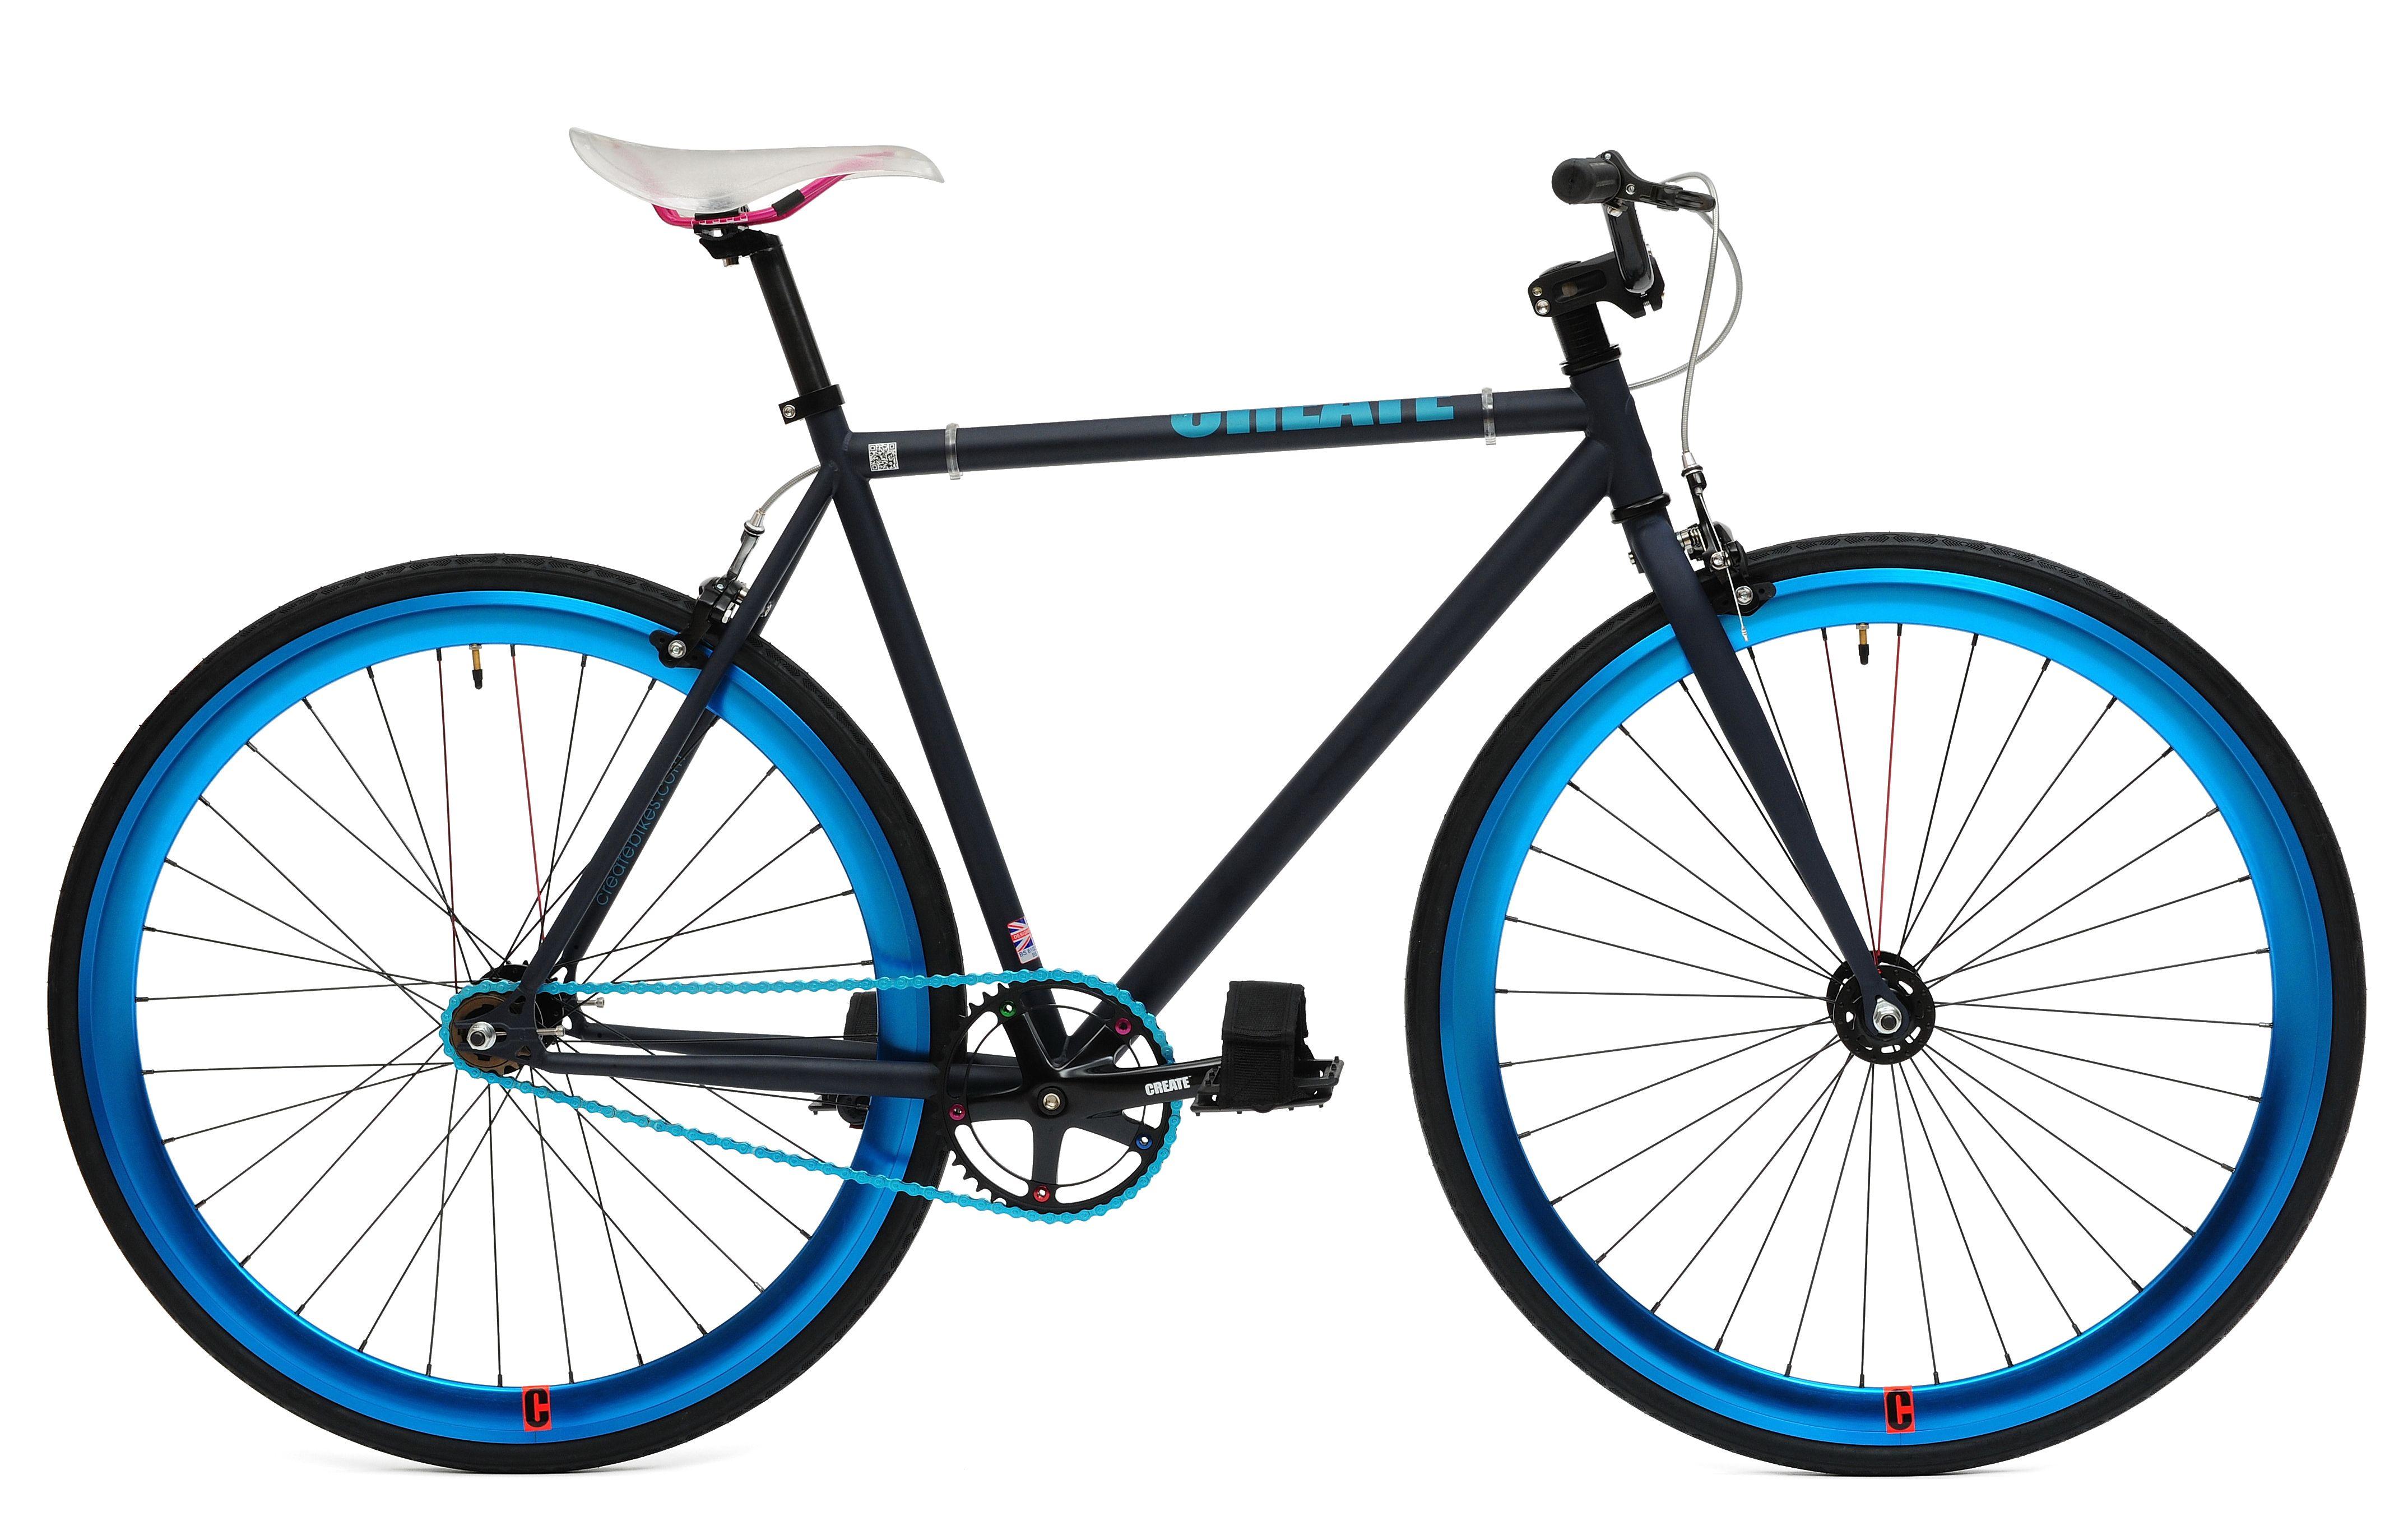 Originals Crbb Create Bikes Speed Bike Single Speed Bike